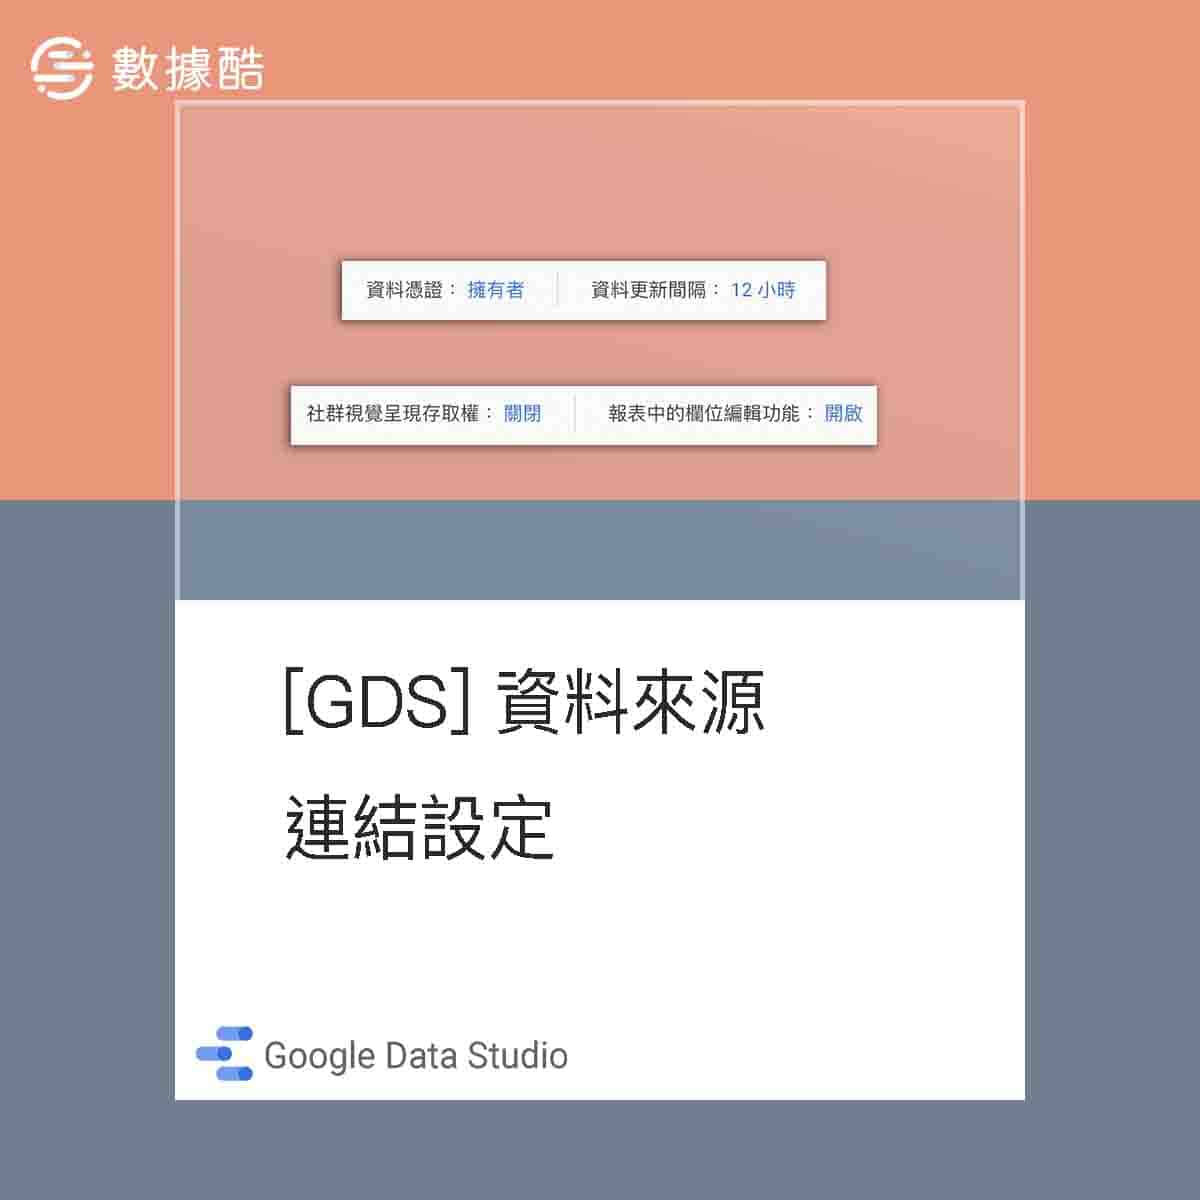 Data studio 資料來源 連結設定